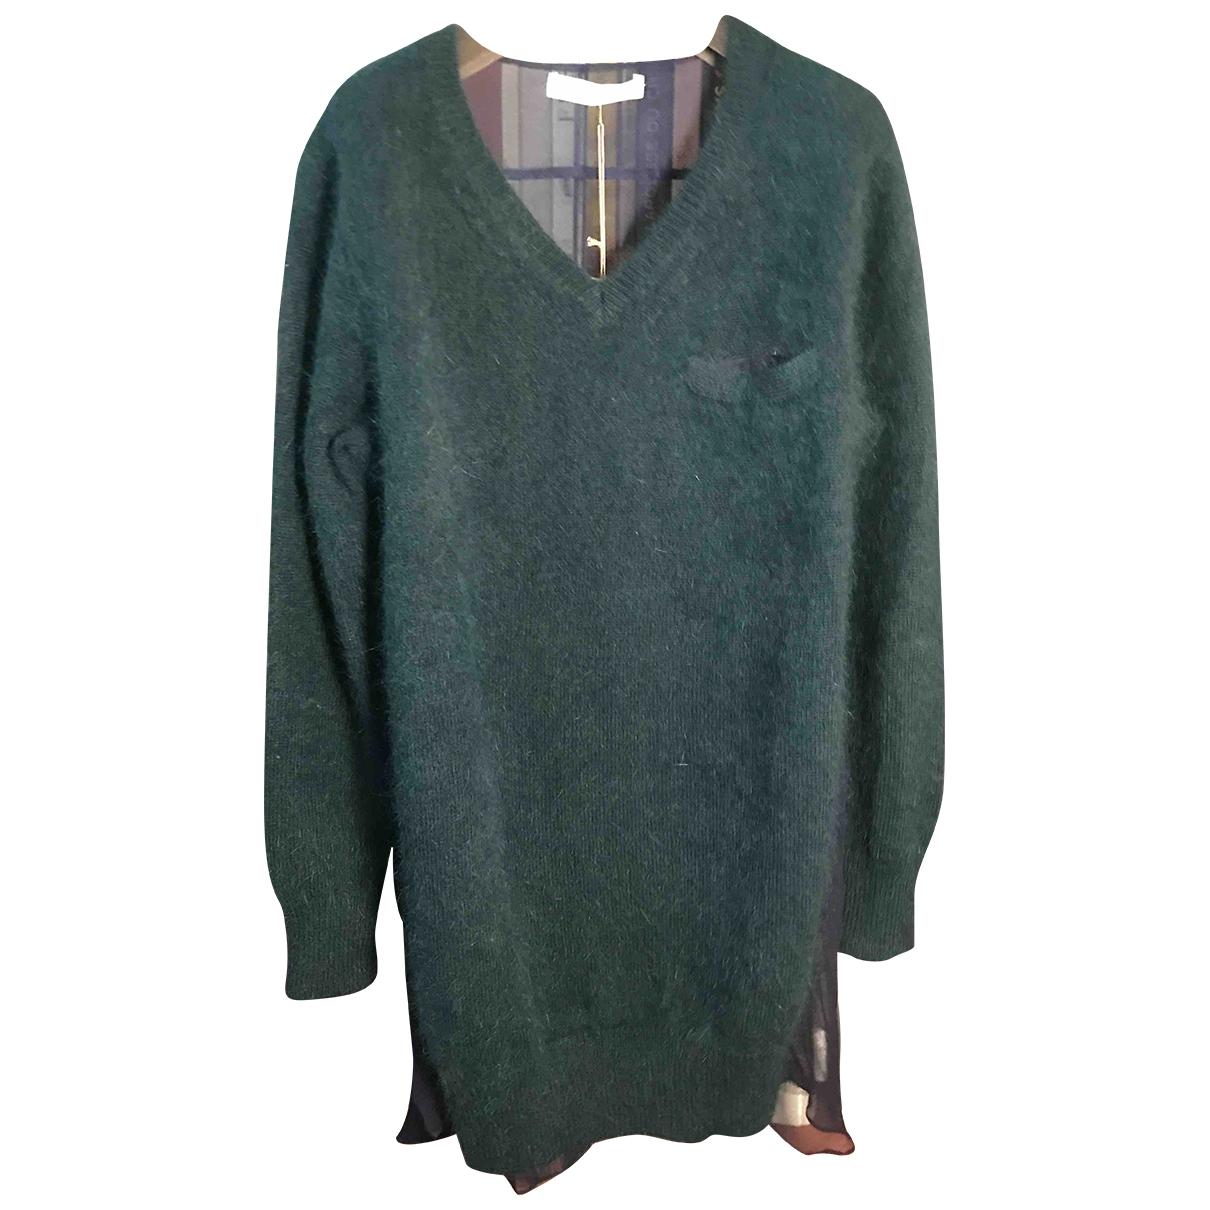 Sacai Luck \N Green Wool Knitwear for Women 1 0-5